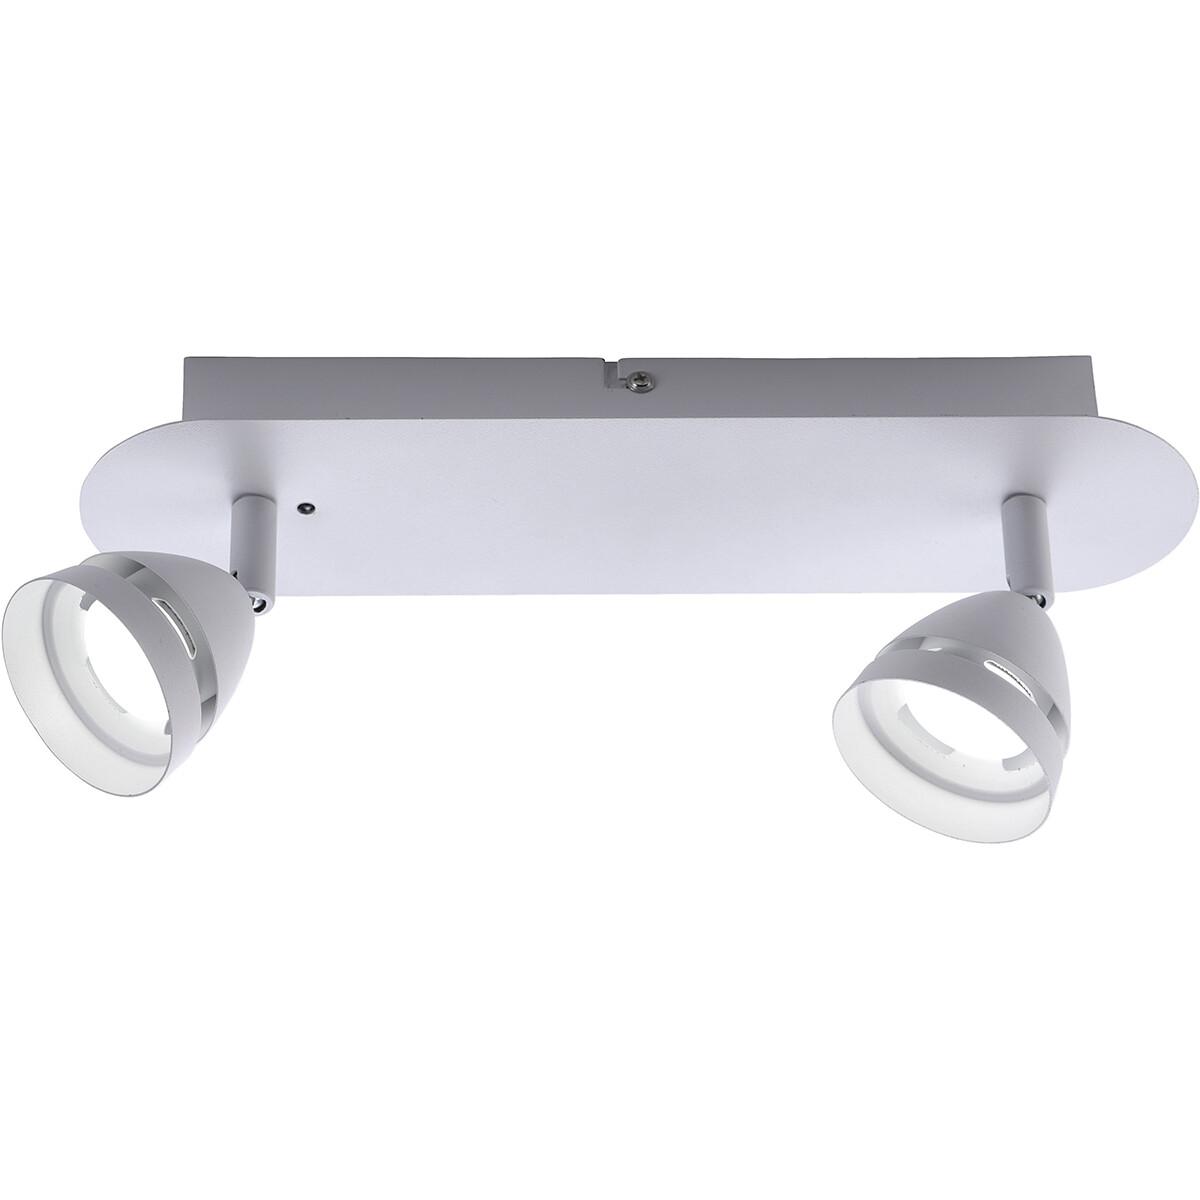 LED Plafondspot - Trion Undy - 6W - Aanpasbare Kleur - 2-lichts - Rechthoek - Mat Wit - Aluminium